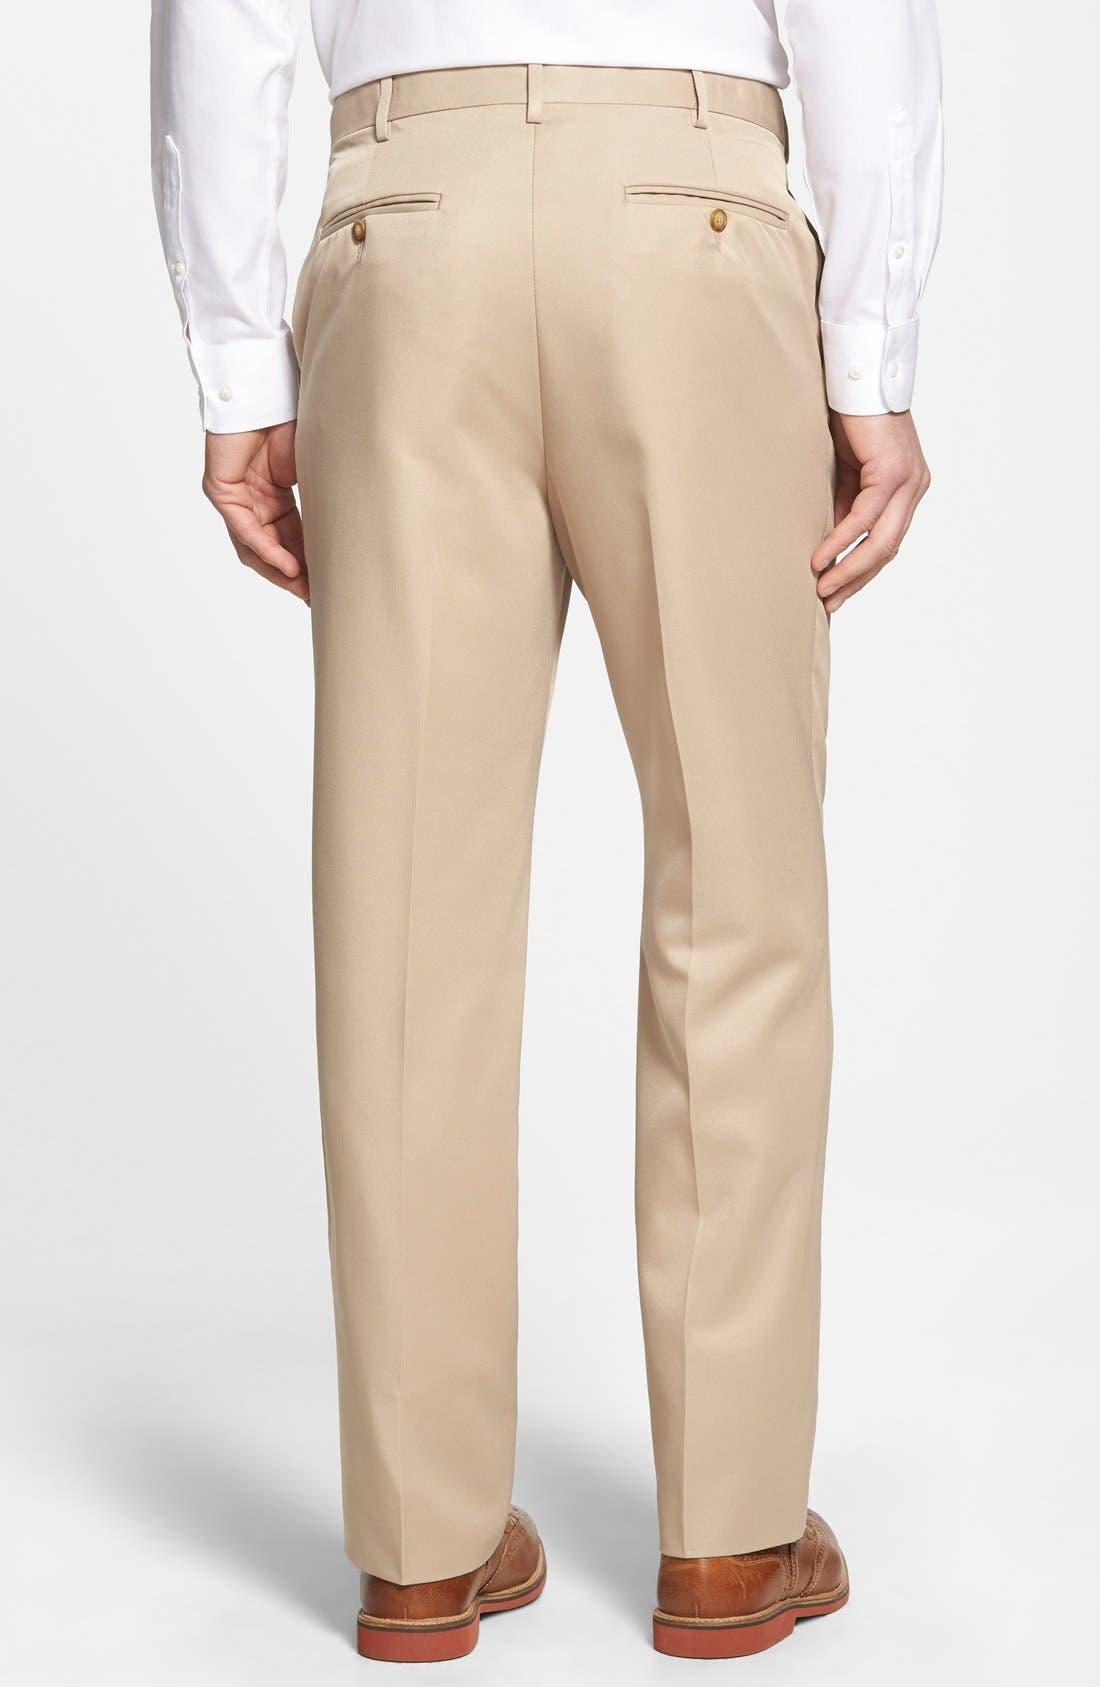 Self Sizer Waist Flat Front Trousers,                             Alternate thumbnail 3, color,                             Tan